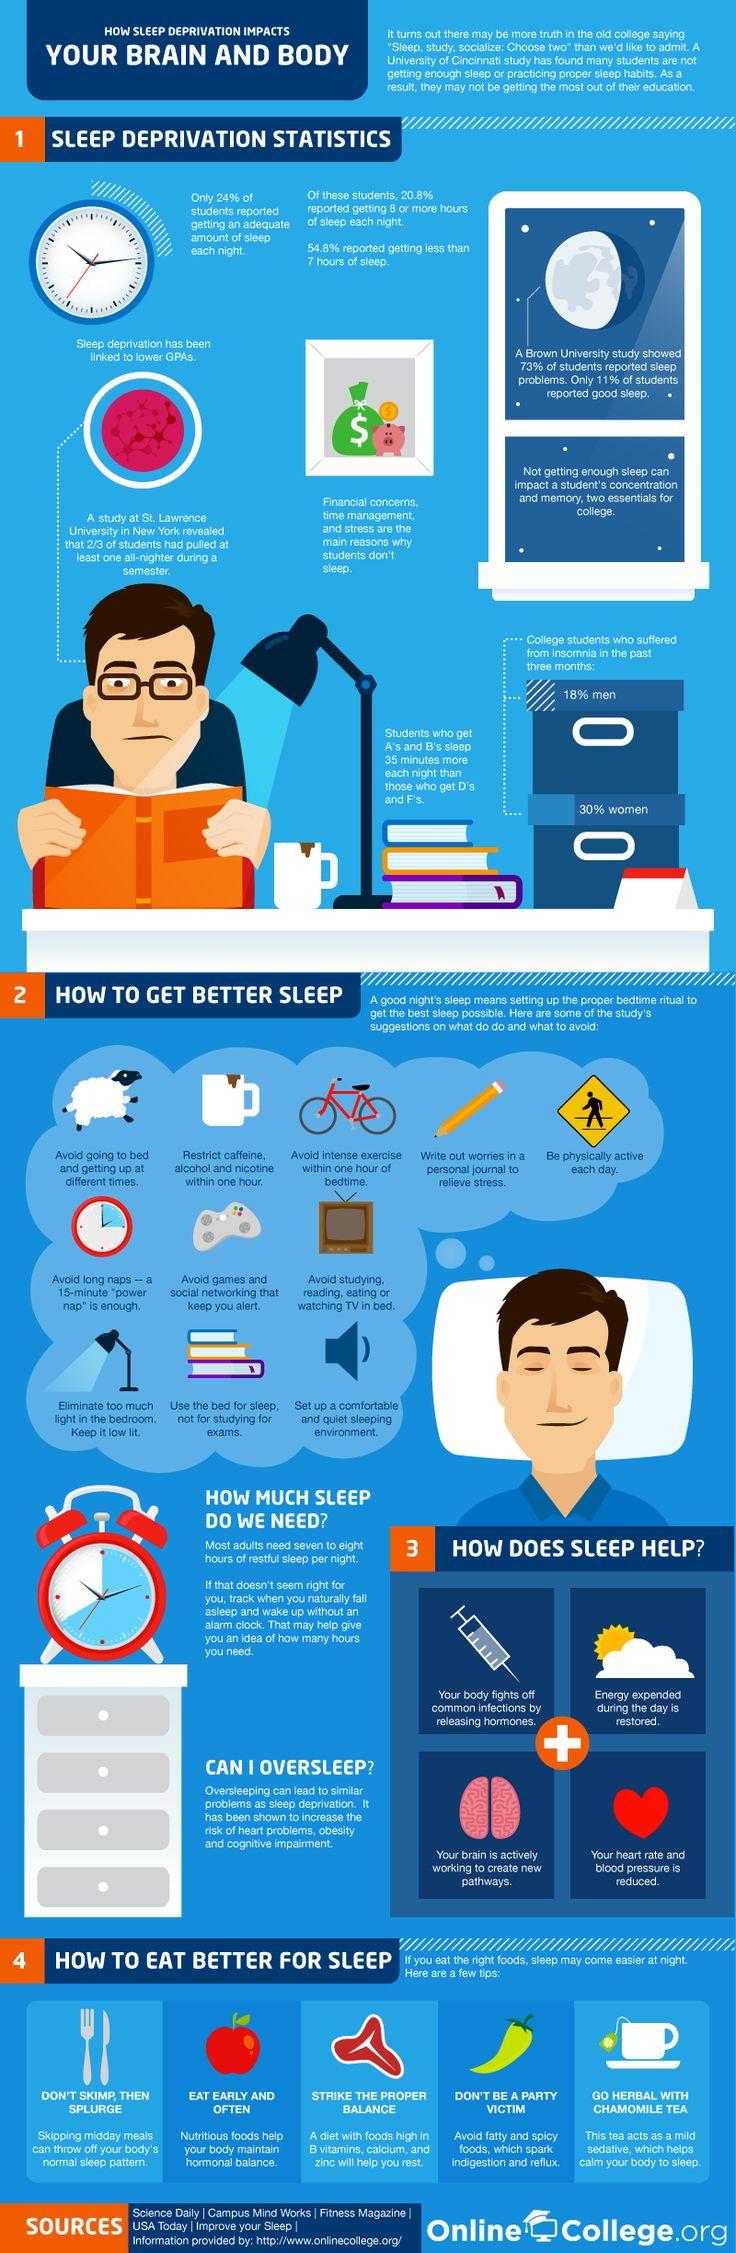 best Sleep Info Science images on Pinterest Insomnia help